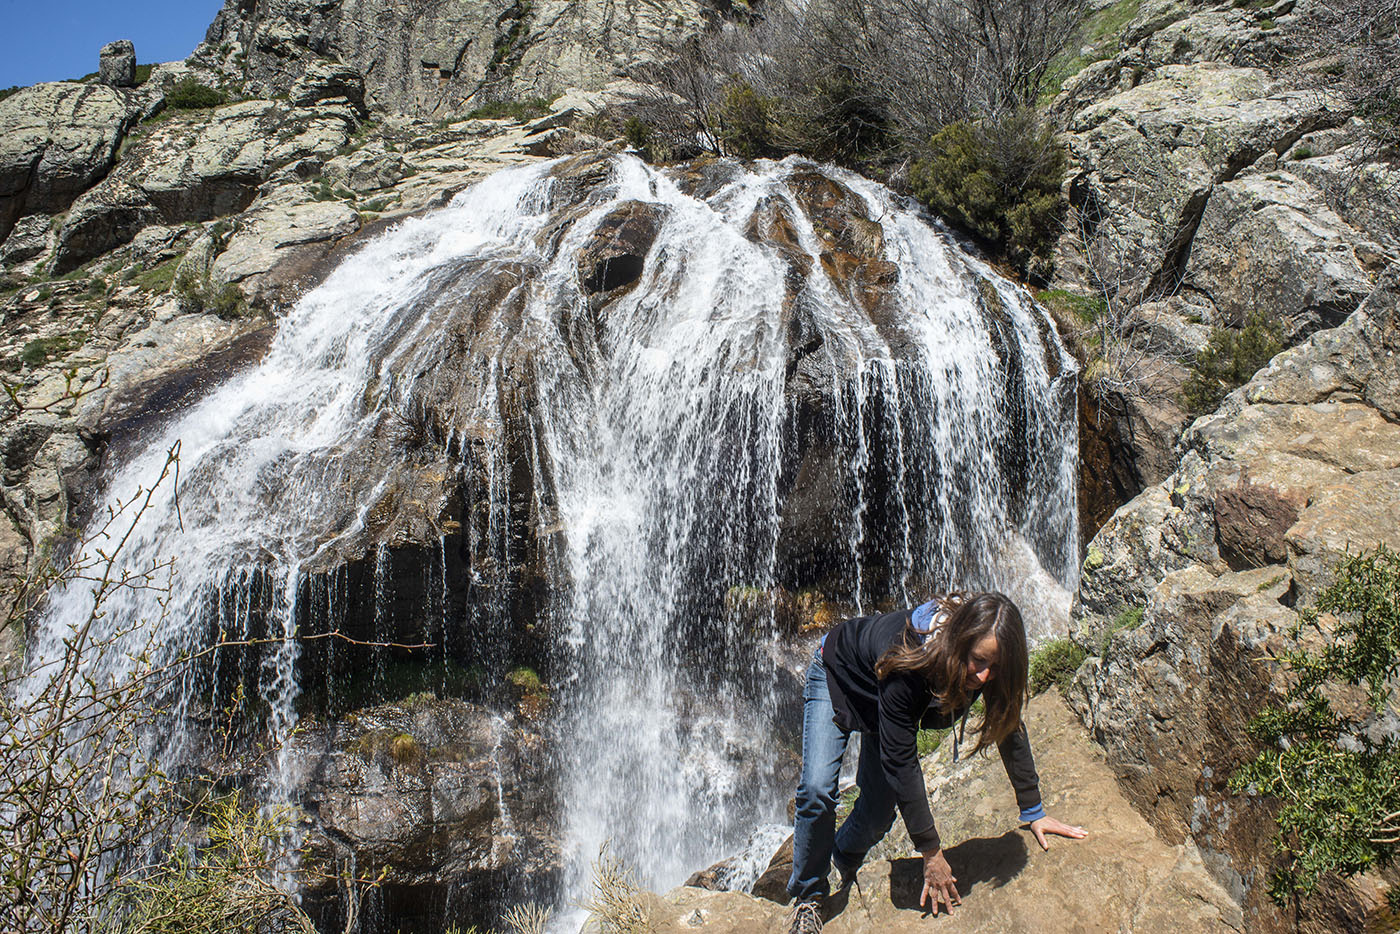 Cascadas de Sierra de Guadarrama: Los Litueros